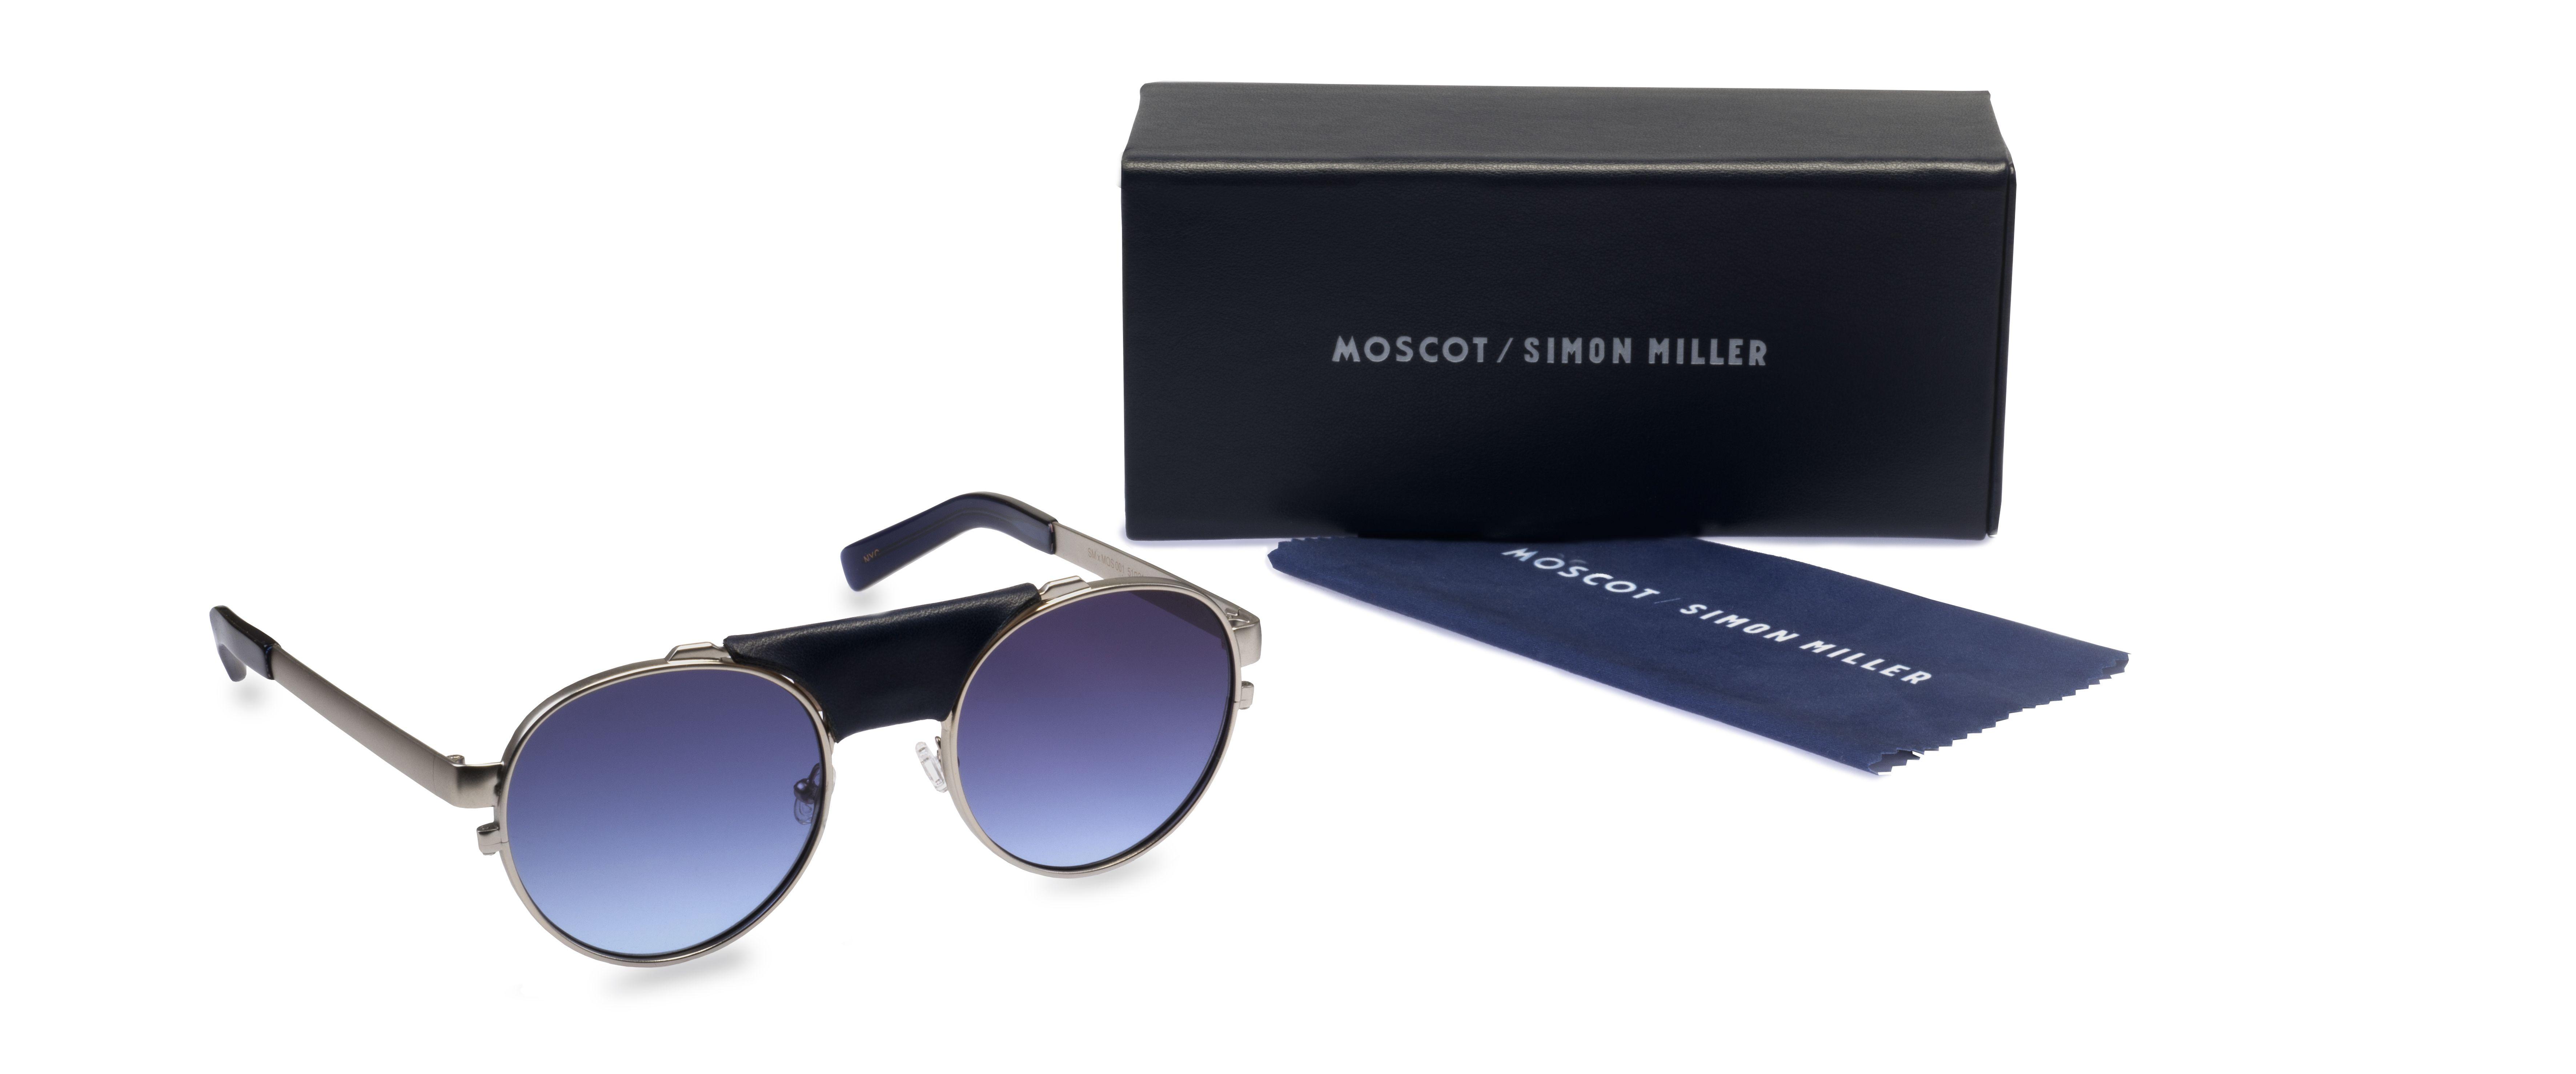 efffdb2b5ed Goodbye Tortoiseshell, Hello Indigo: Meet Your New Favorite Sunglasses